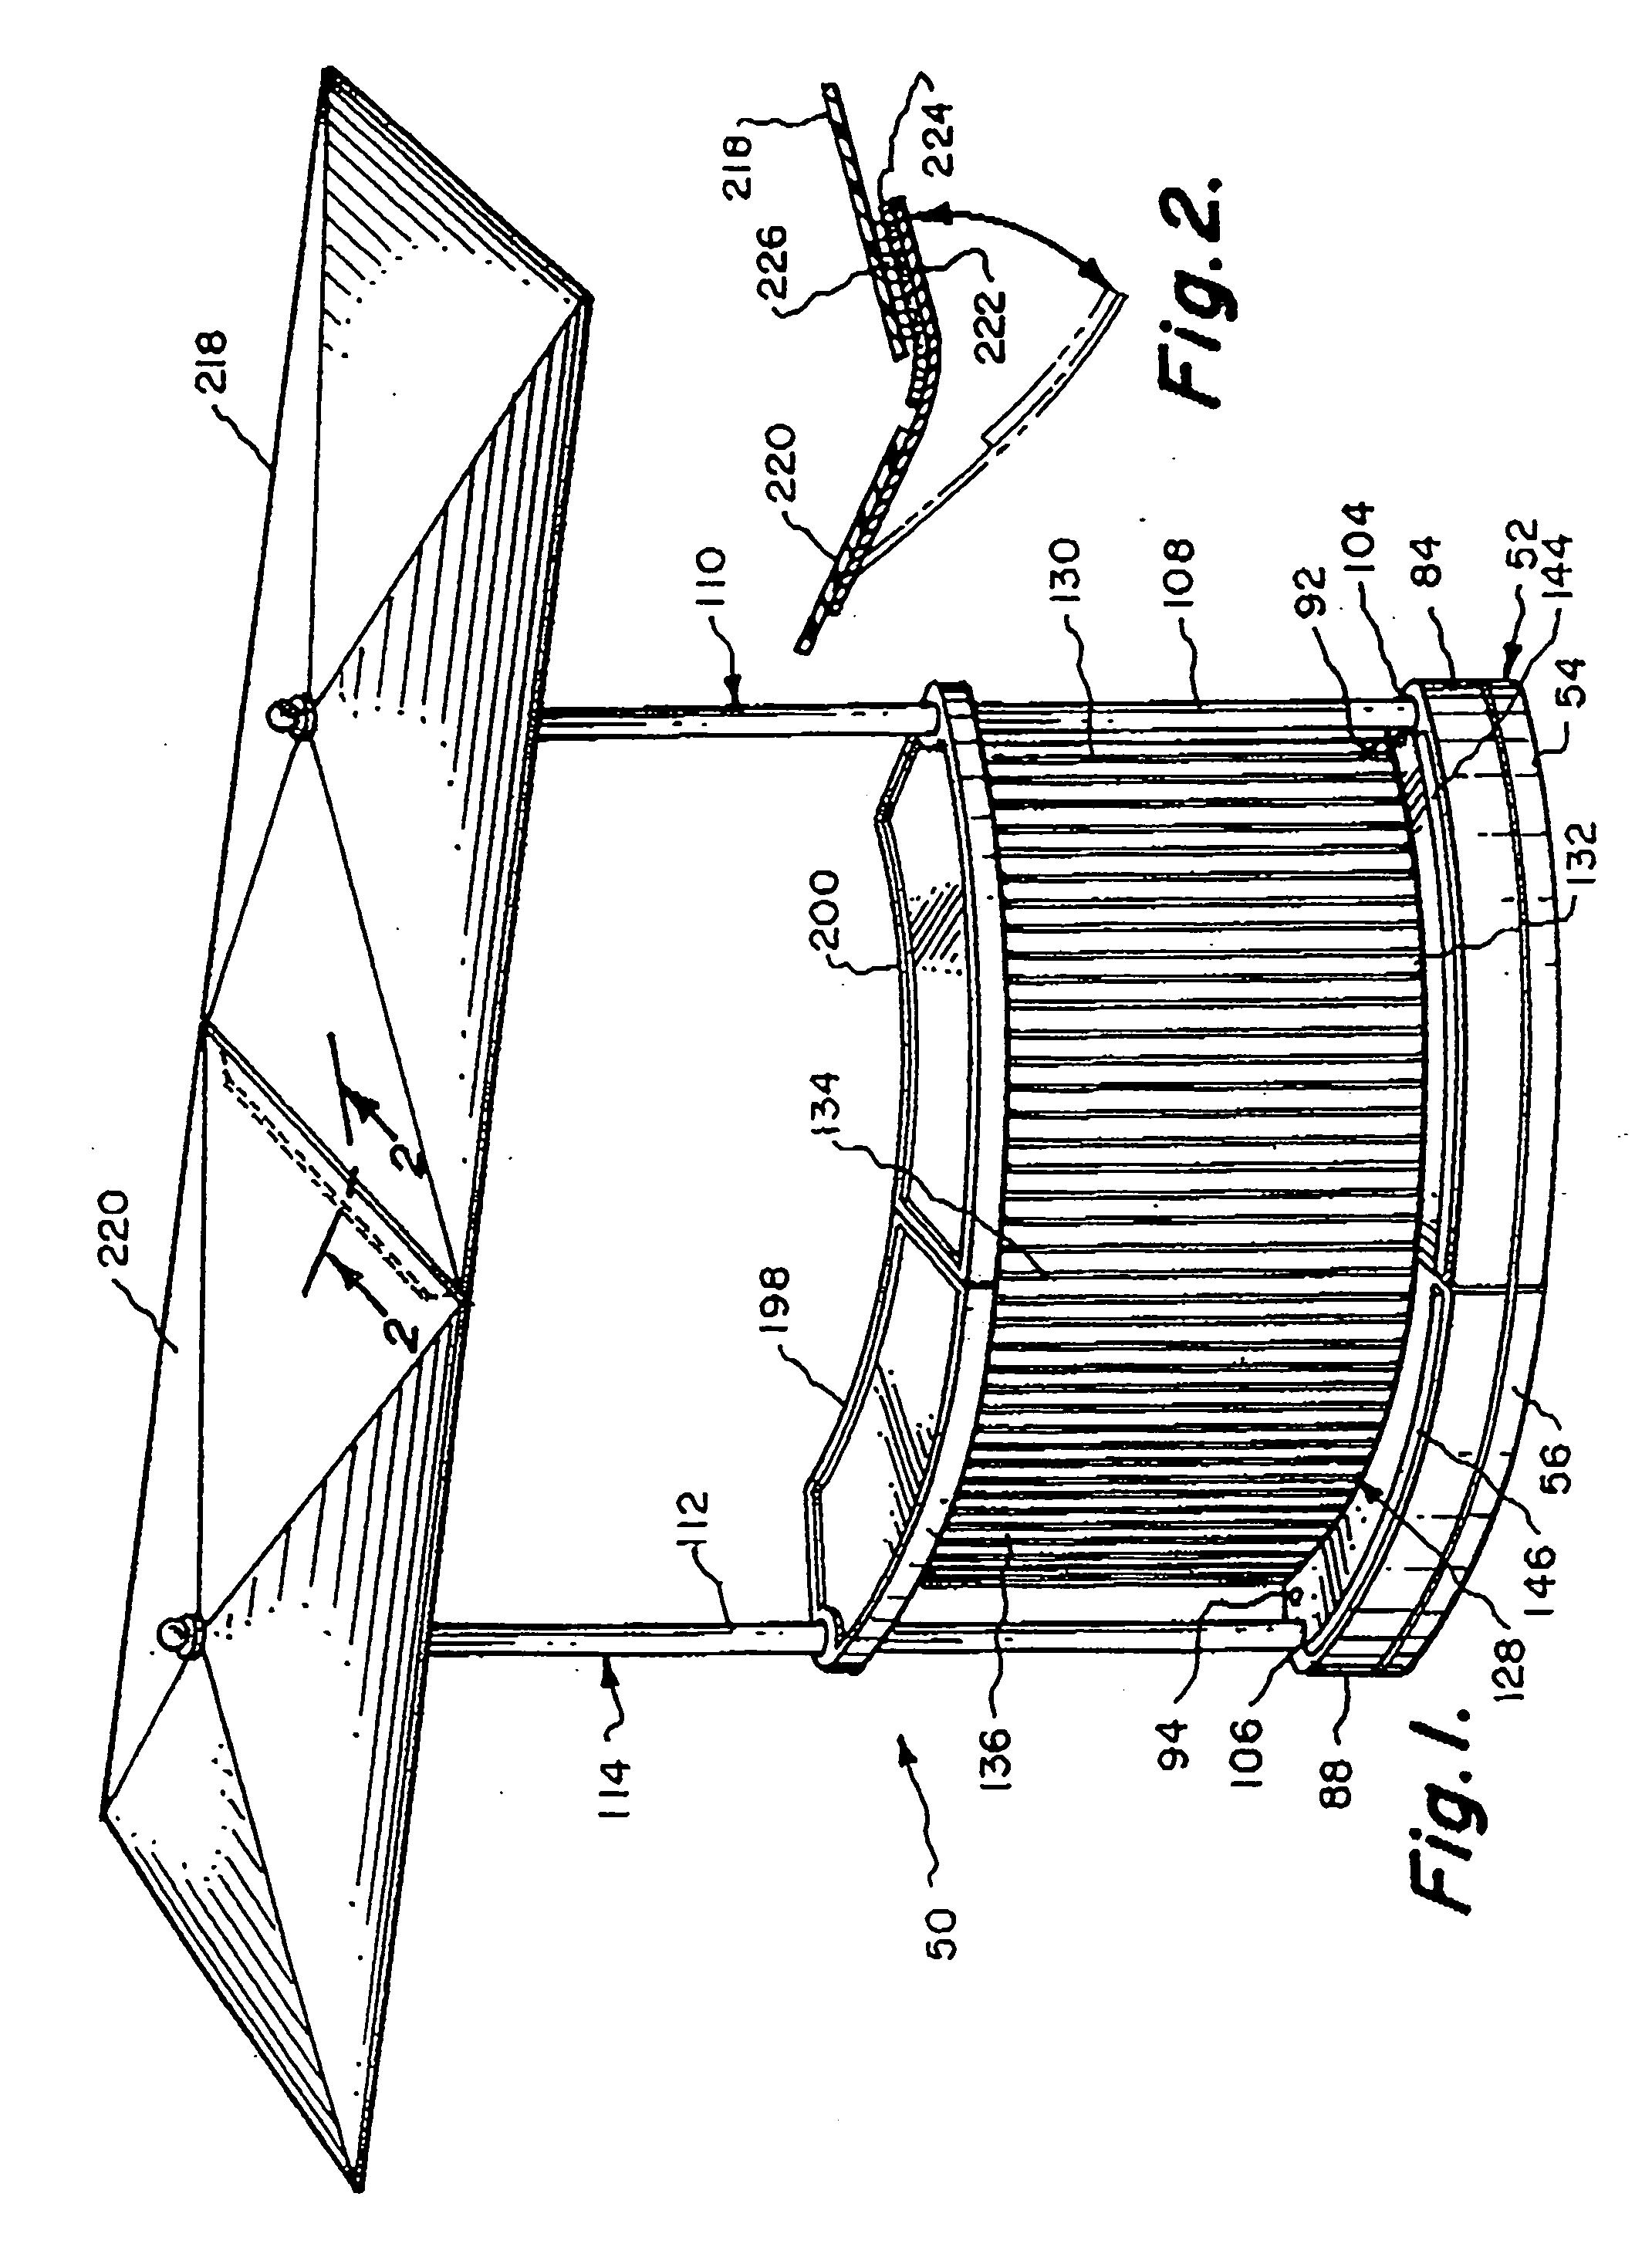 1988 Mazda Rx7 Wiring Diagram Imageresizertool Com